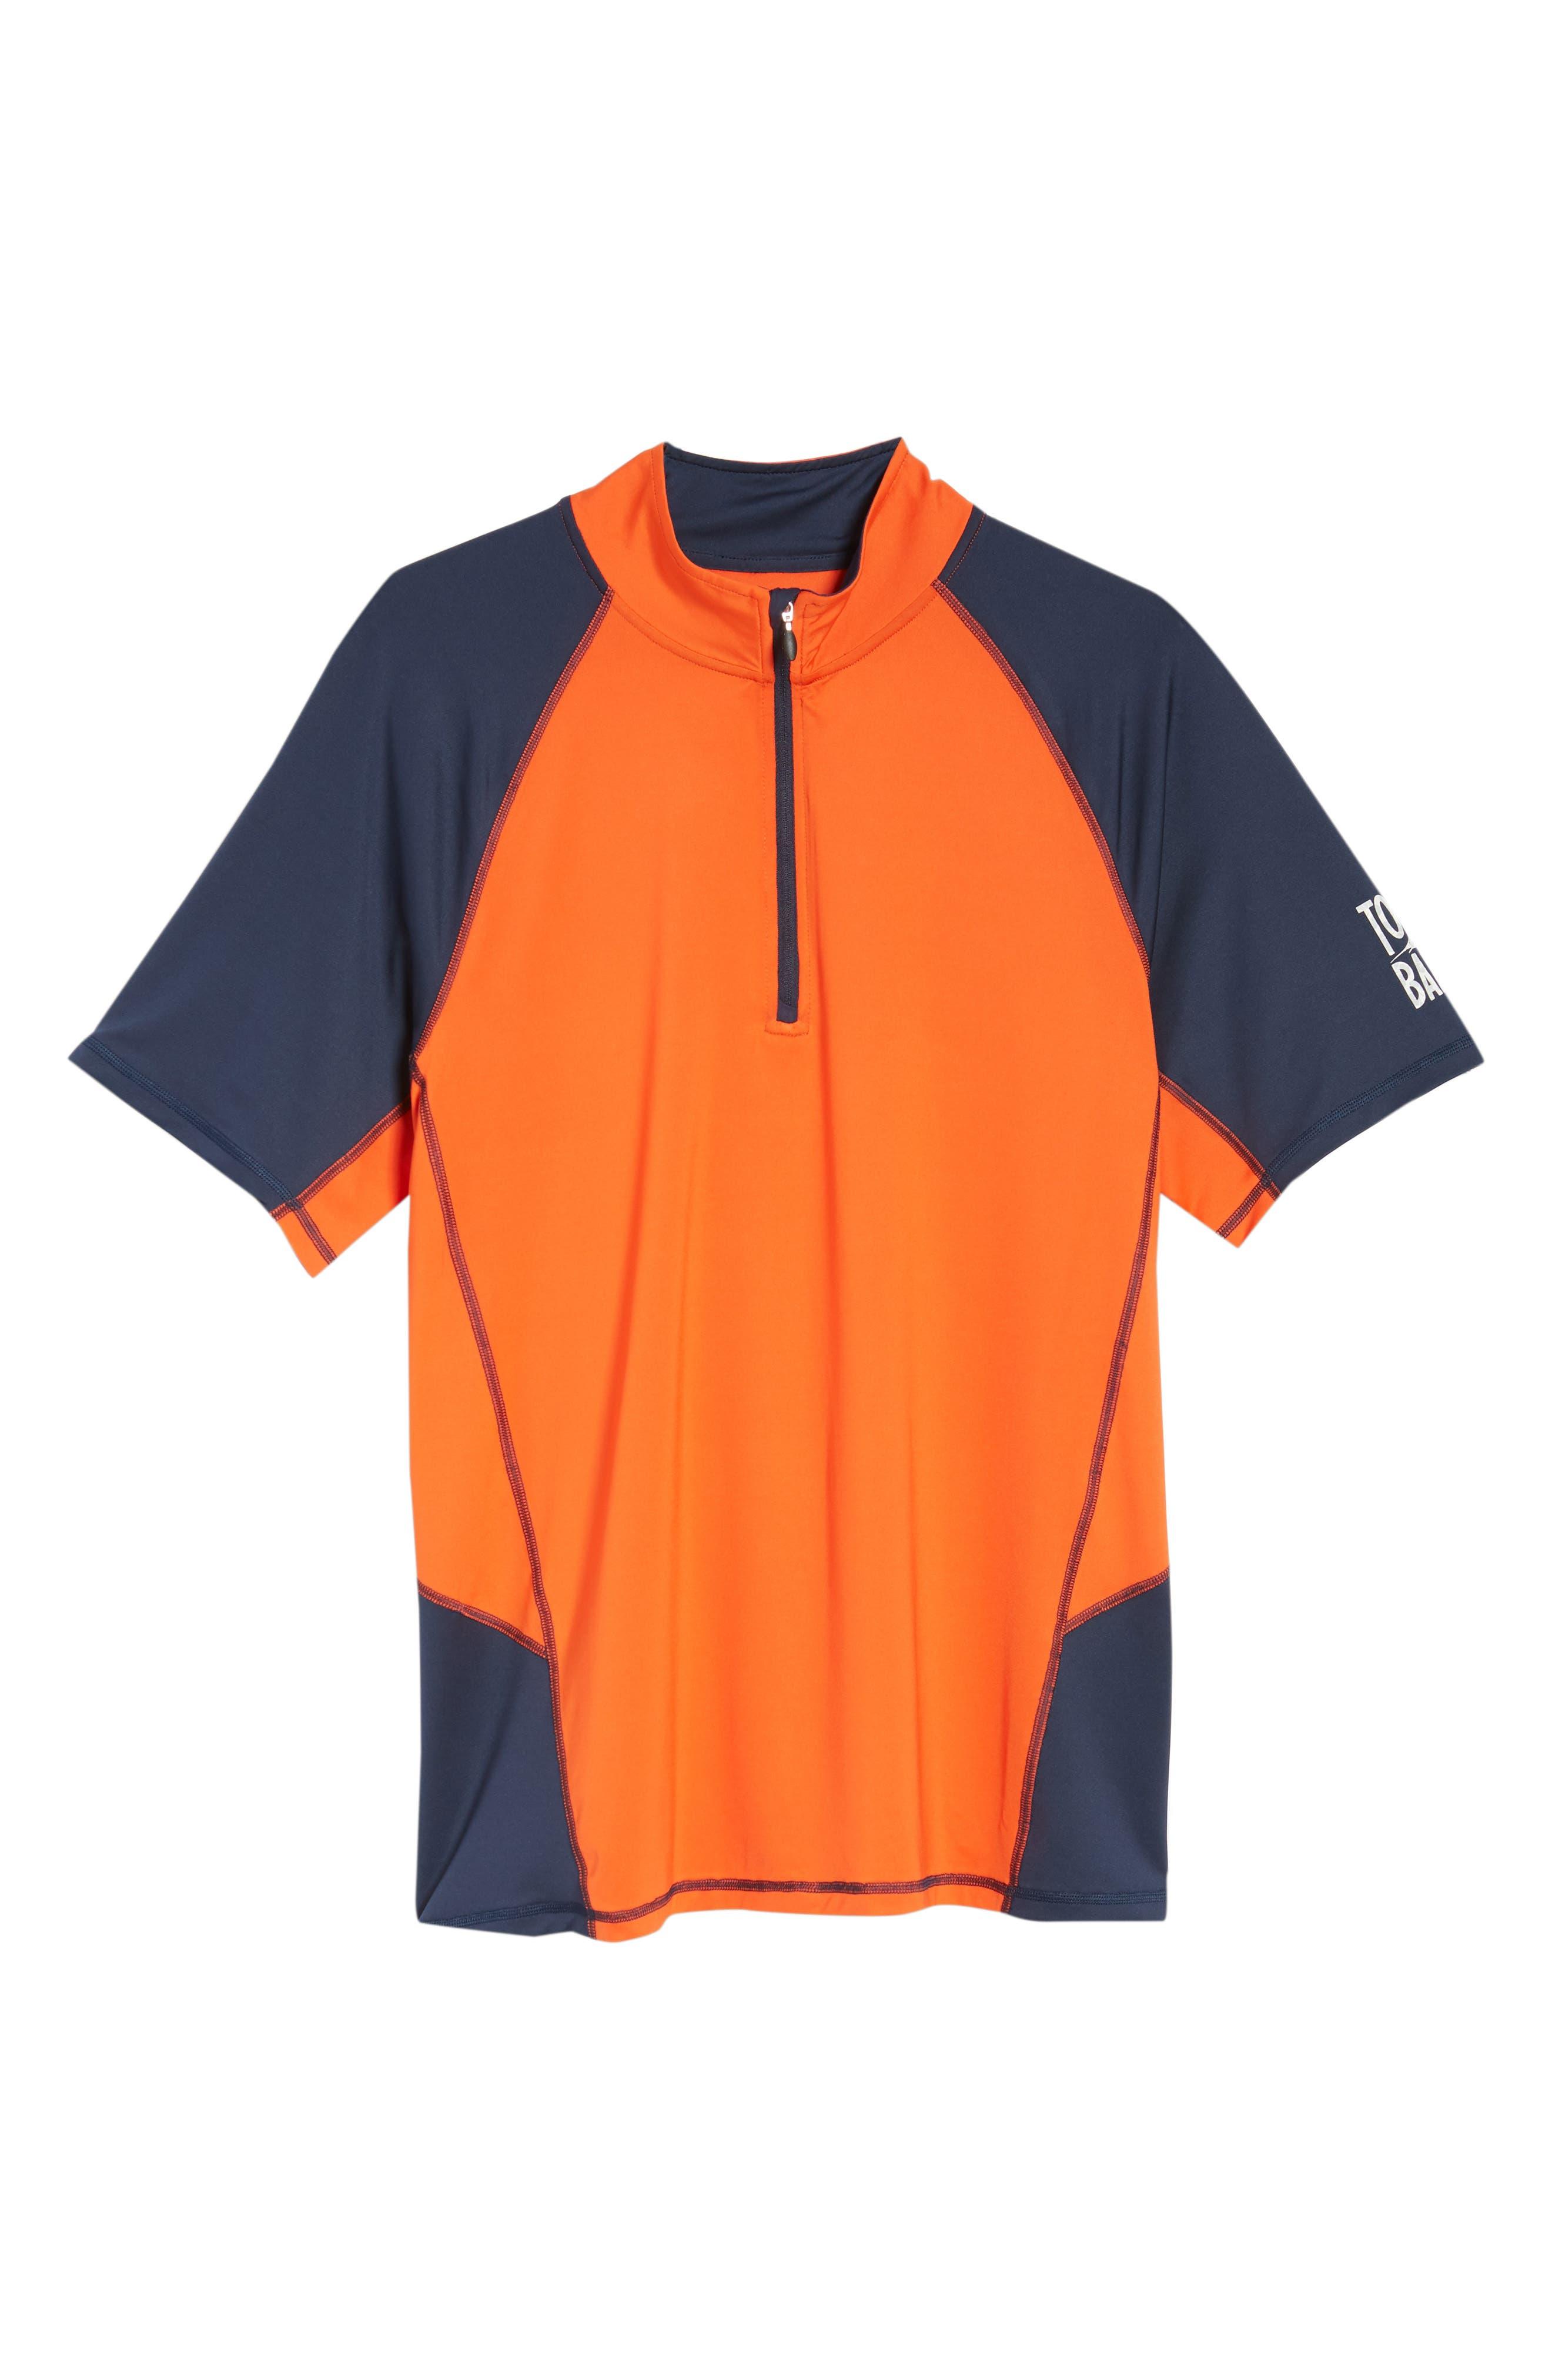 IslandActive<sup>™</sup> Colorblock Beach Pro Rashguard T-Shirt,                             Alternate thumbnail 6, color,                             Fire Orange